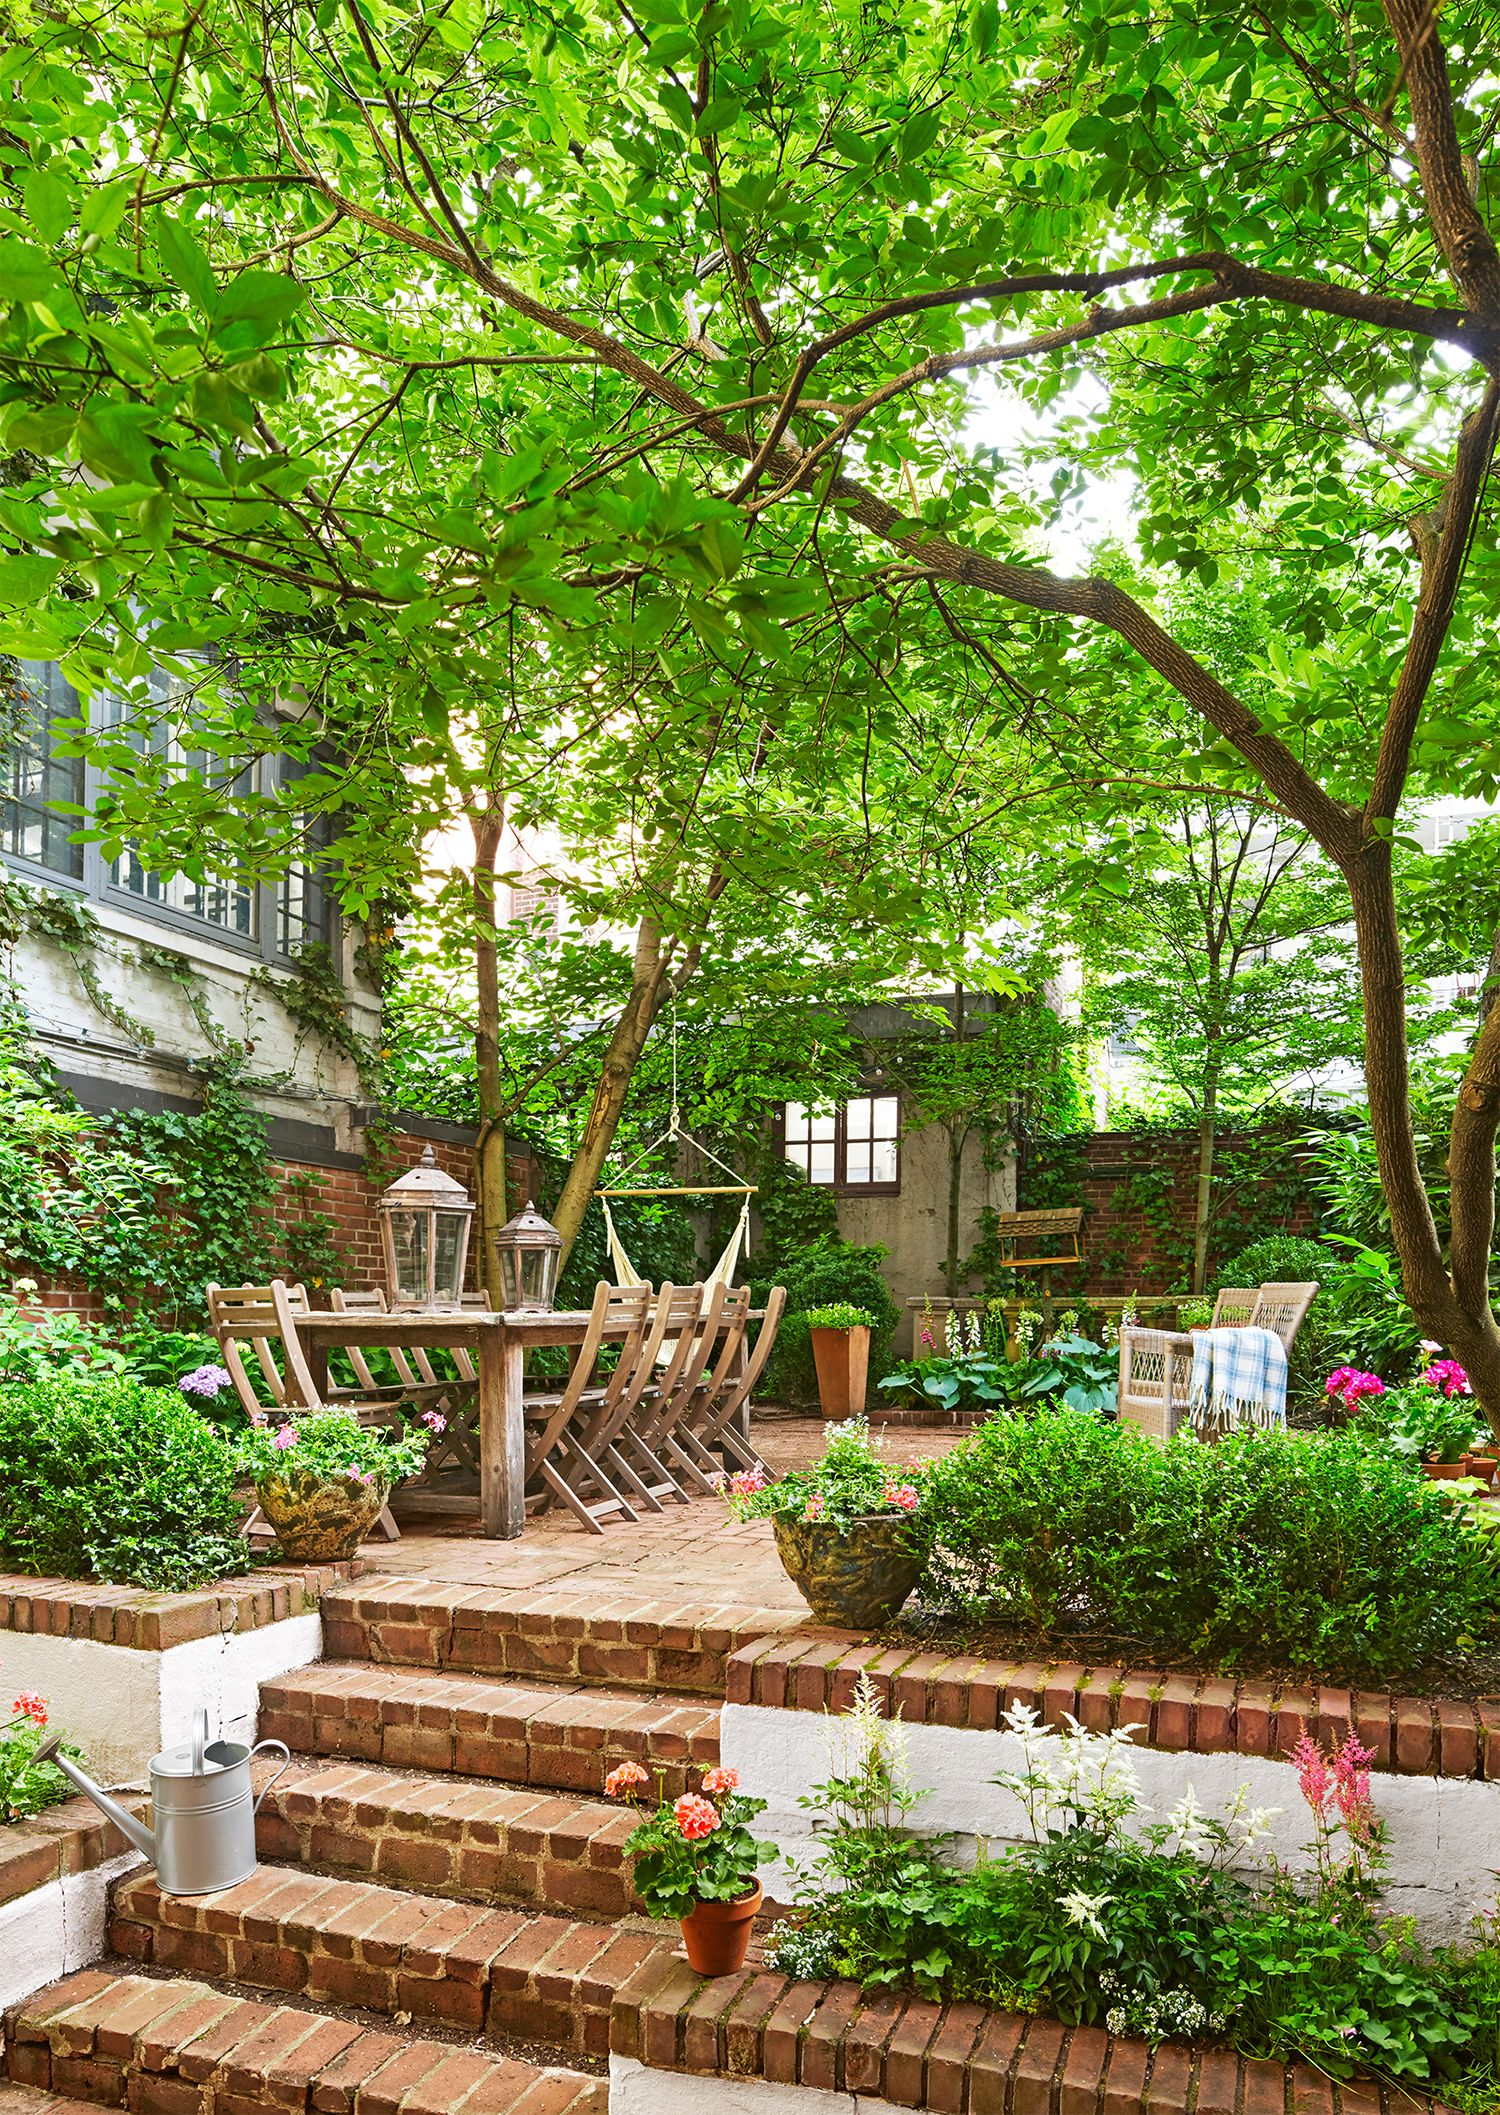 18 Creative Small Garden Ideas - Indoor and Outdoor Garden ... on Small Landscape Garden Ideas id=75673